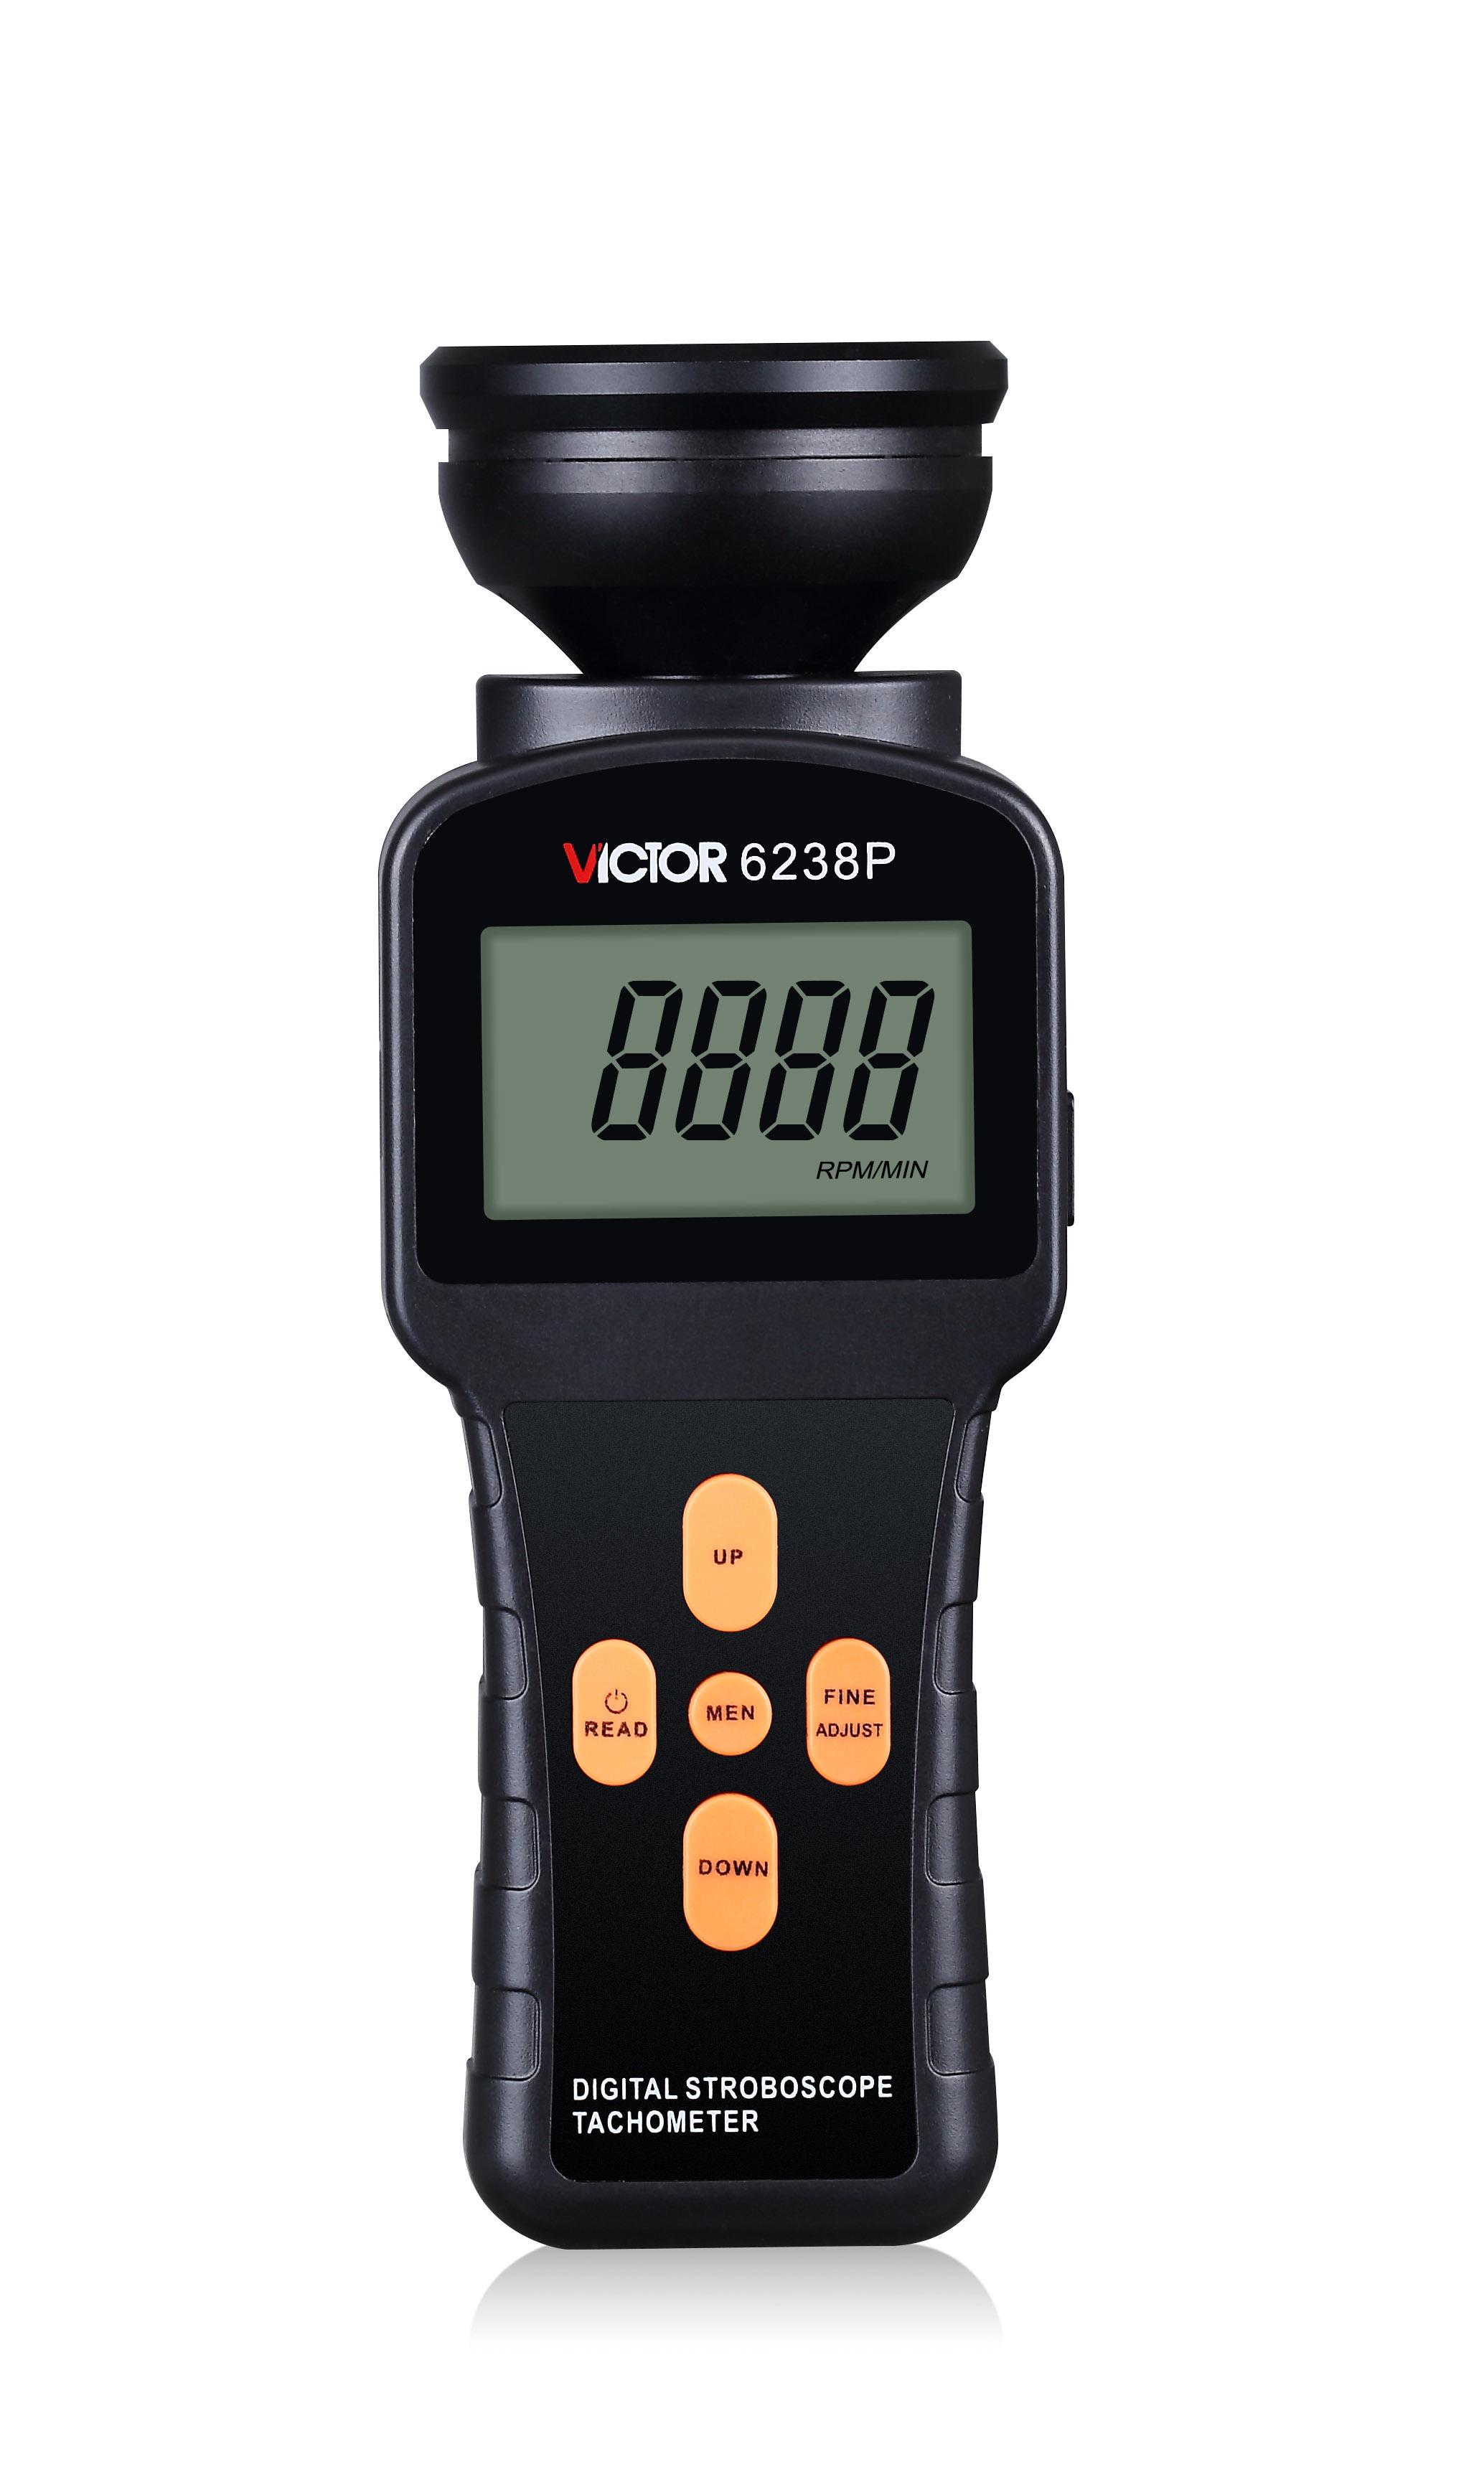 VICTOR 6238P